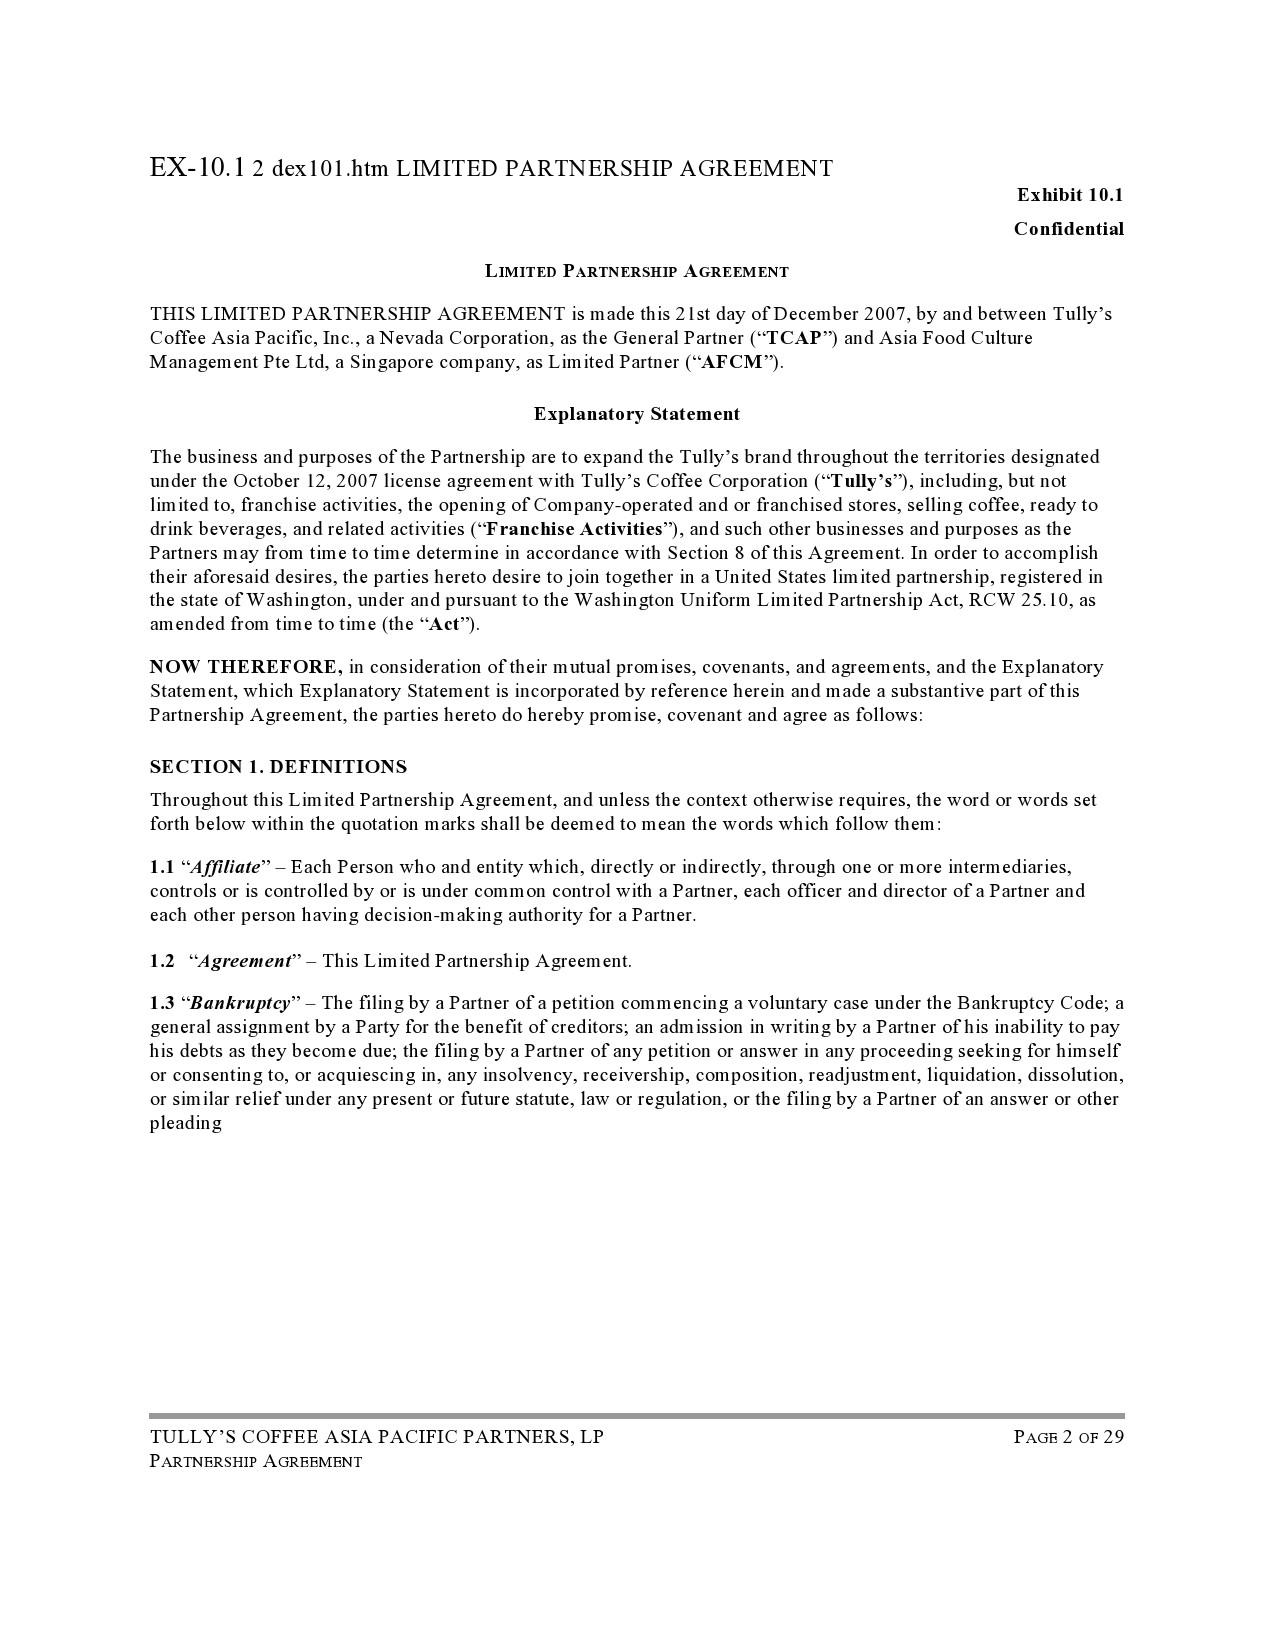 Free limited partnership agreement 04